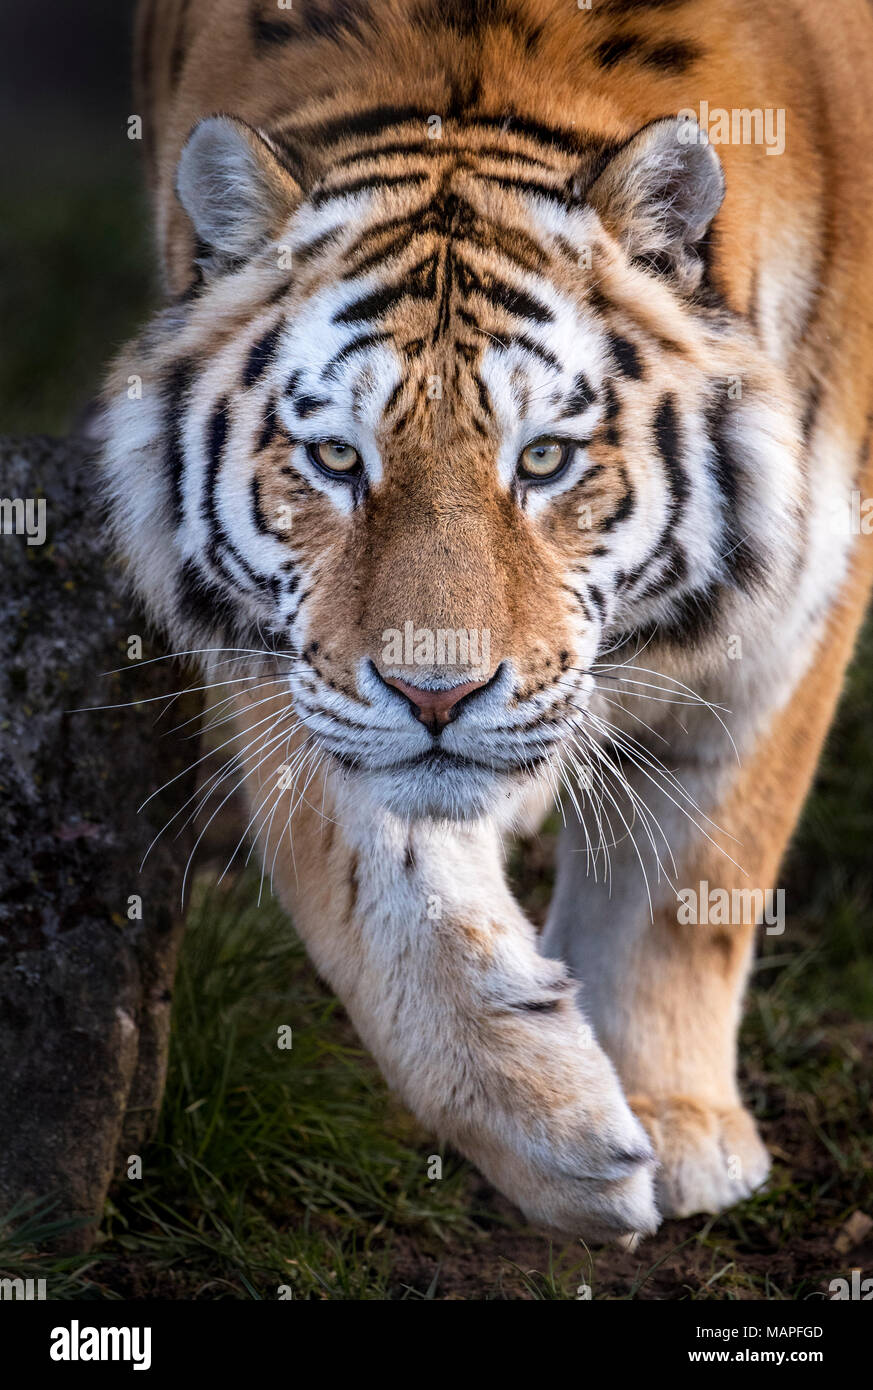 Male Amur tiger walking towards camera Stock Photo